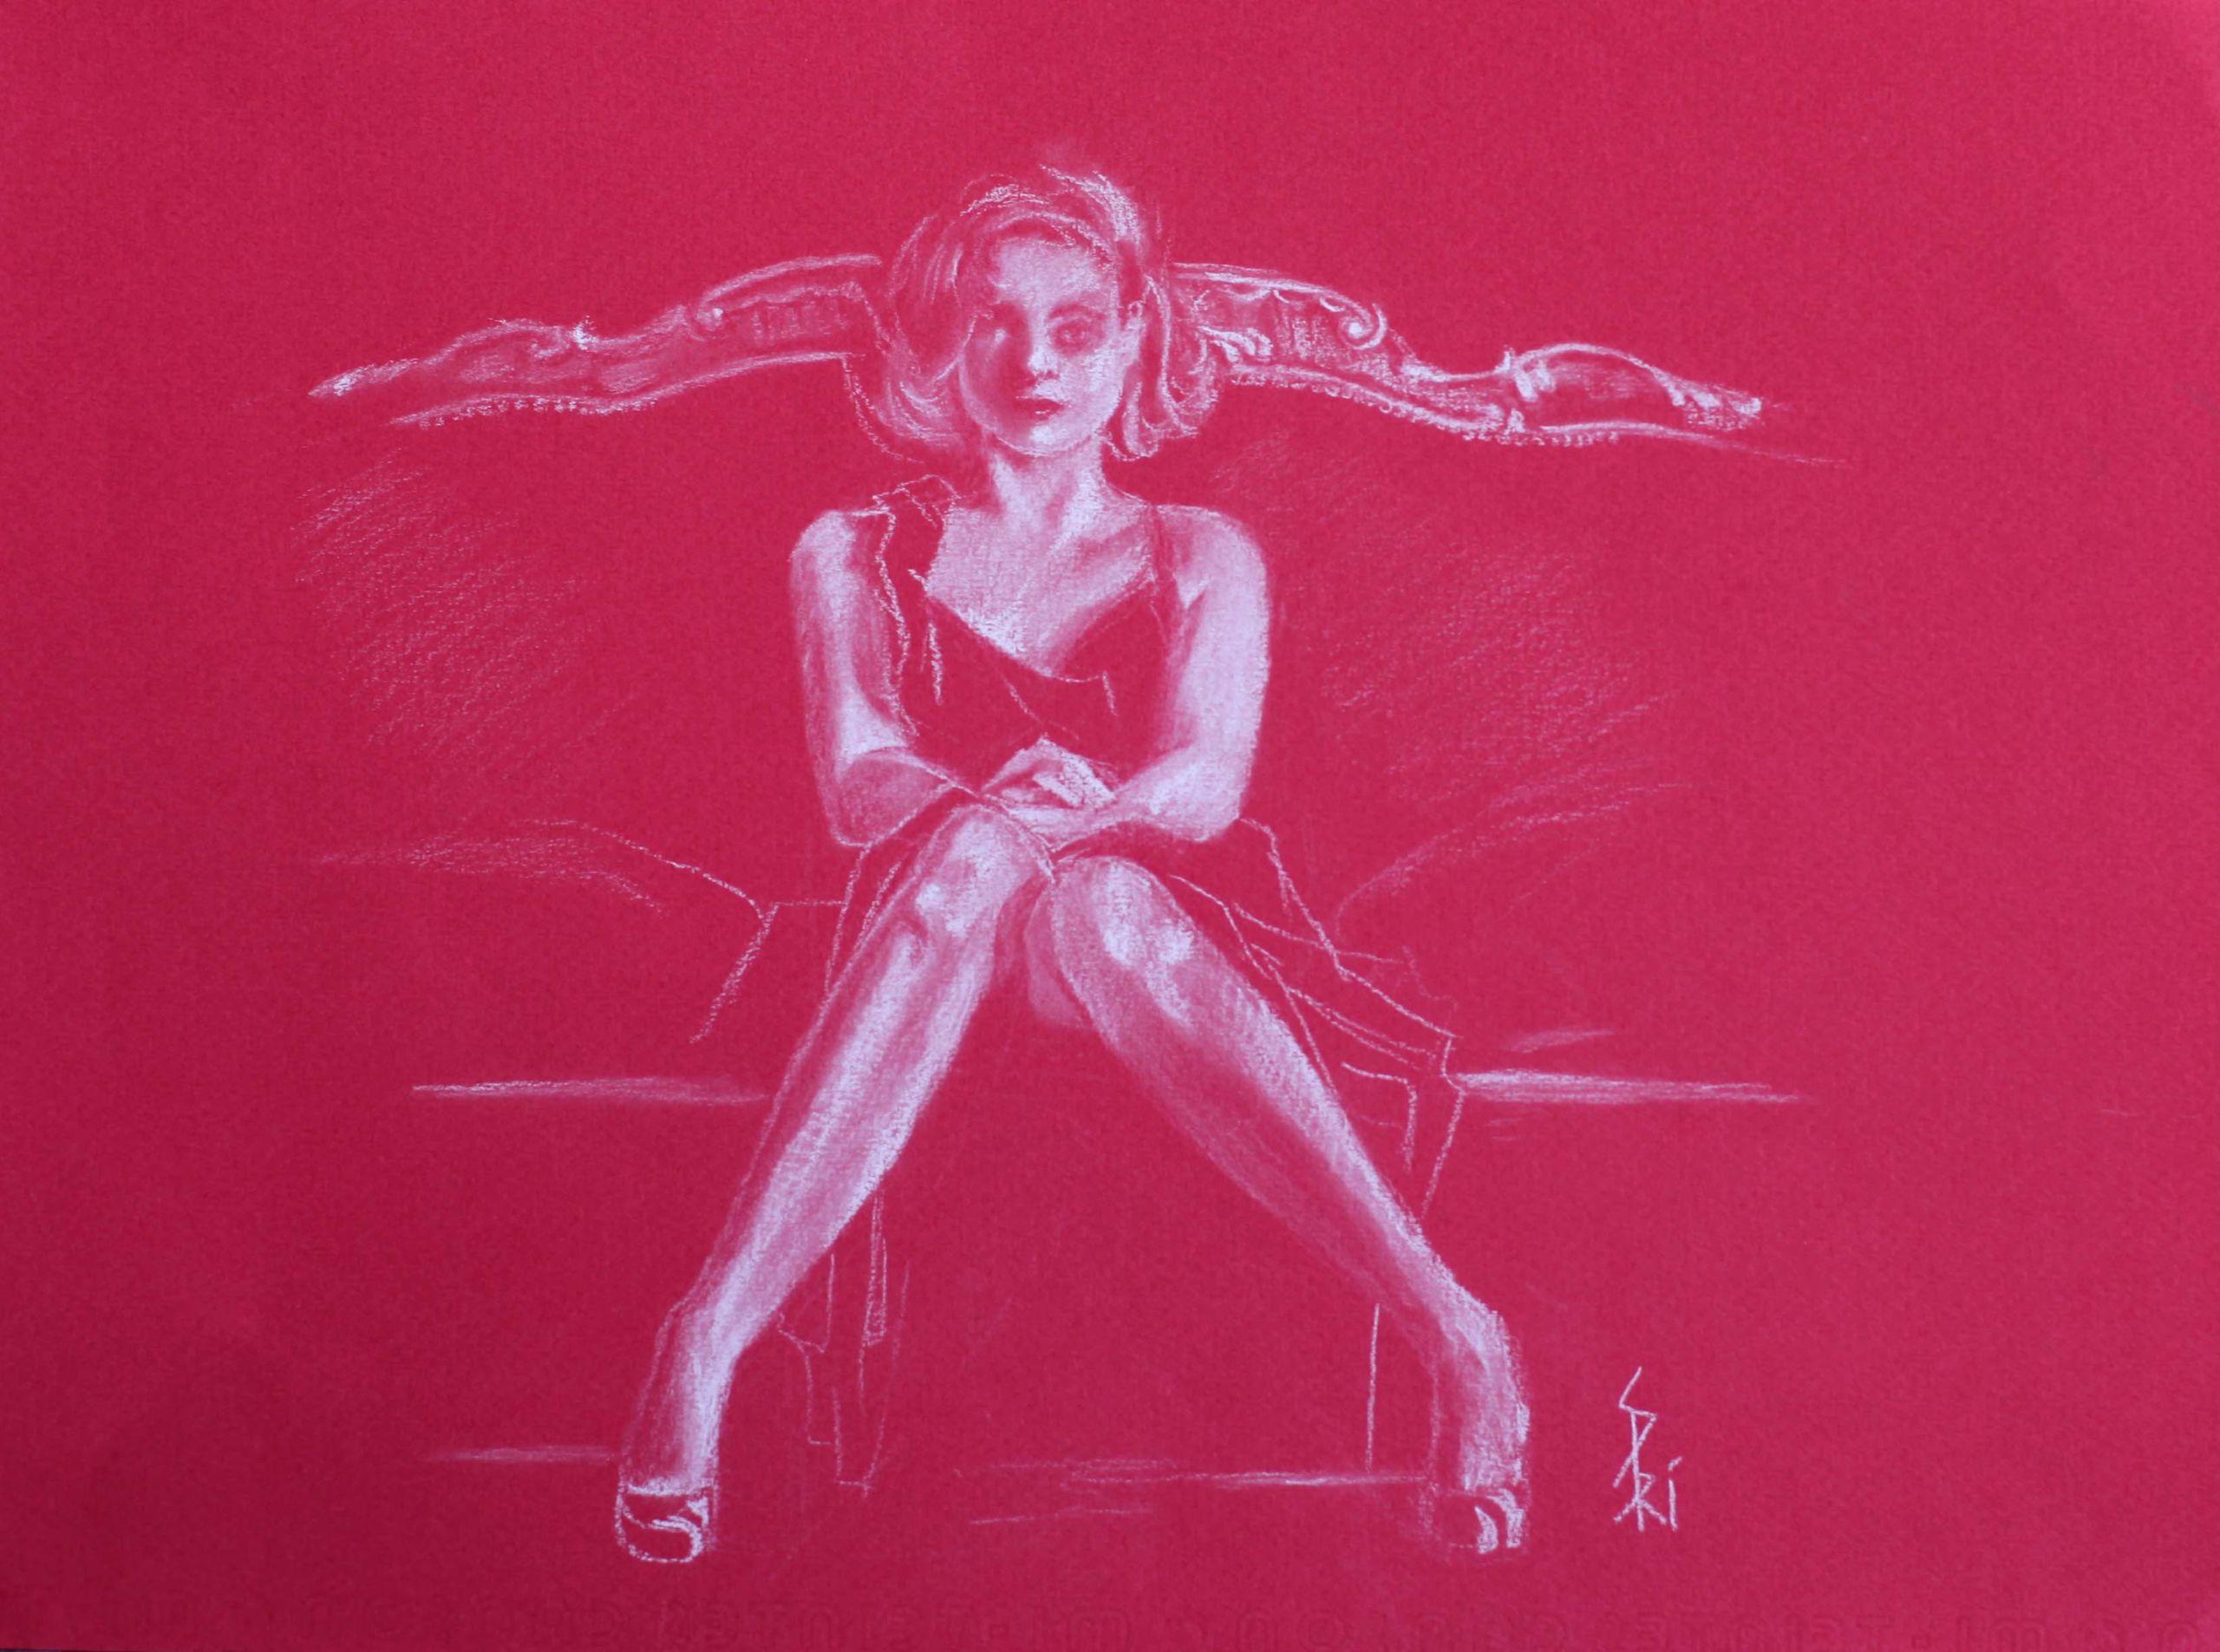 Dessin au crayon par Priscilla Seiller